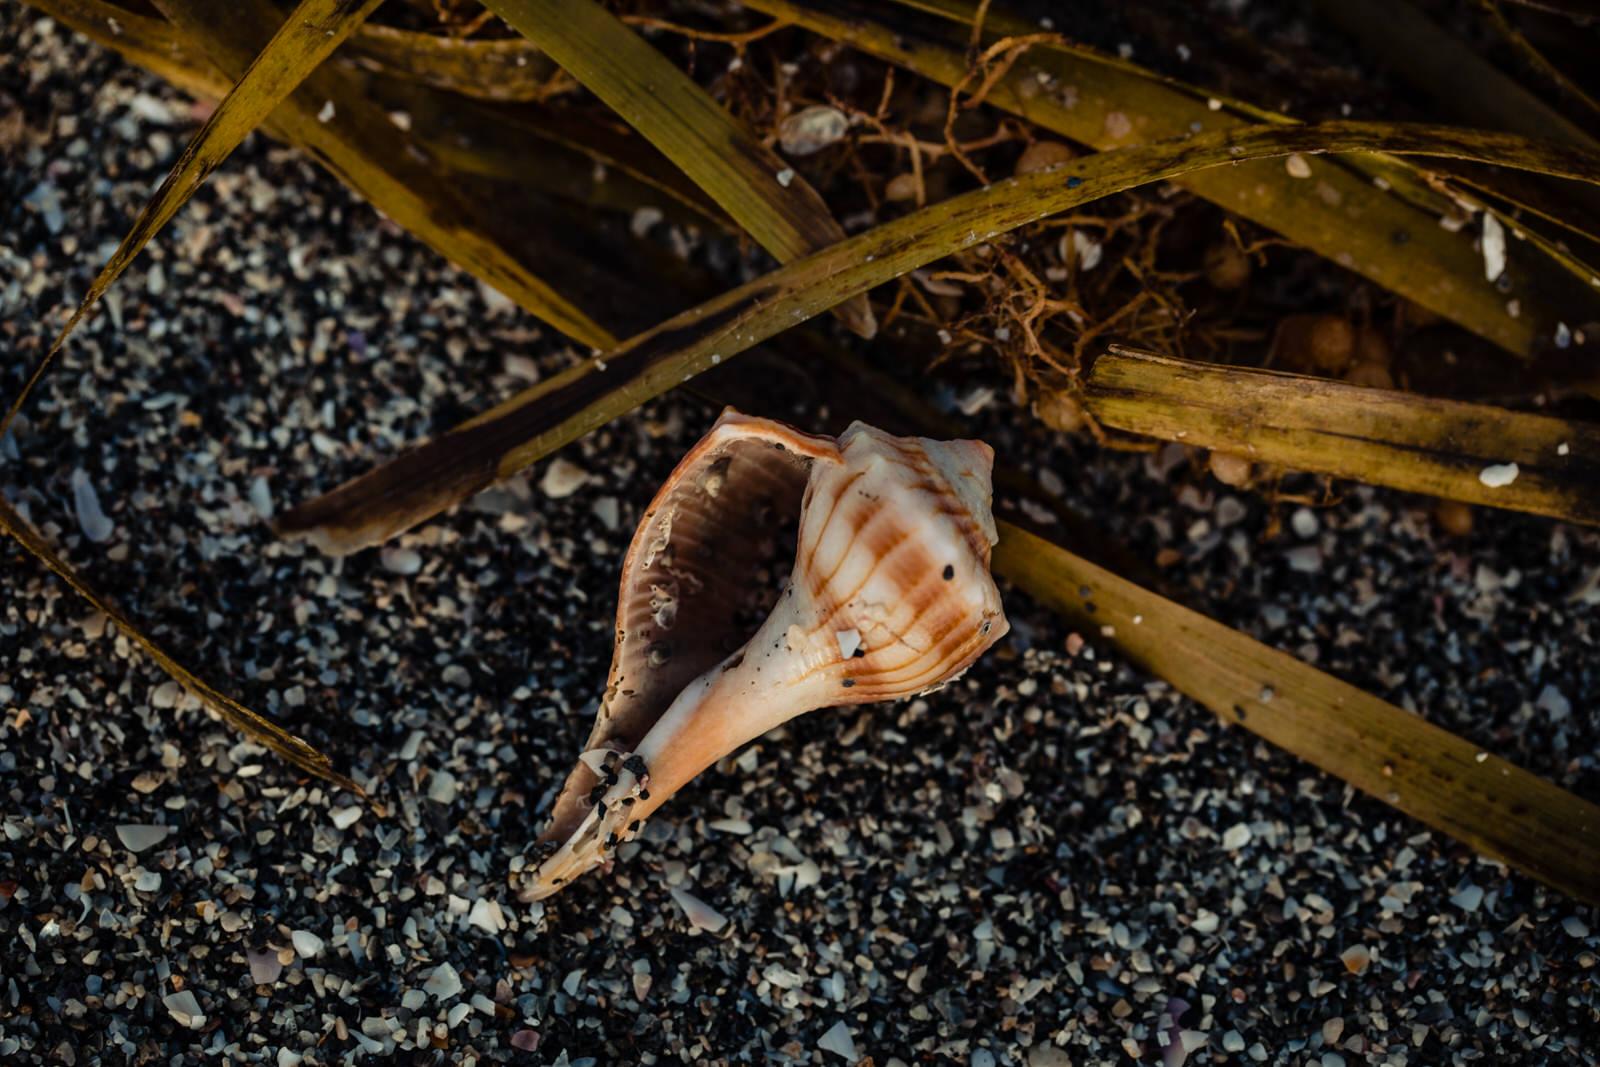 siesta-key-florida-tiny-house-photo-vacation-beach-nature-macro-19.jpg